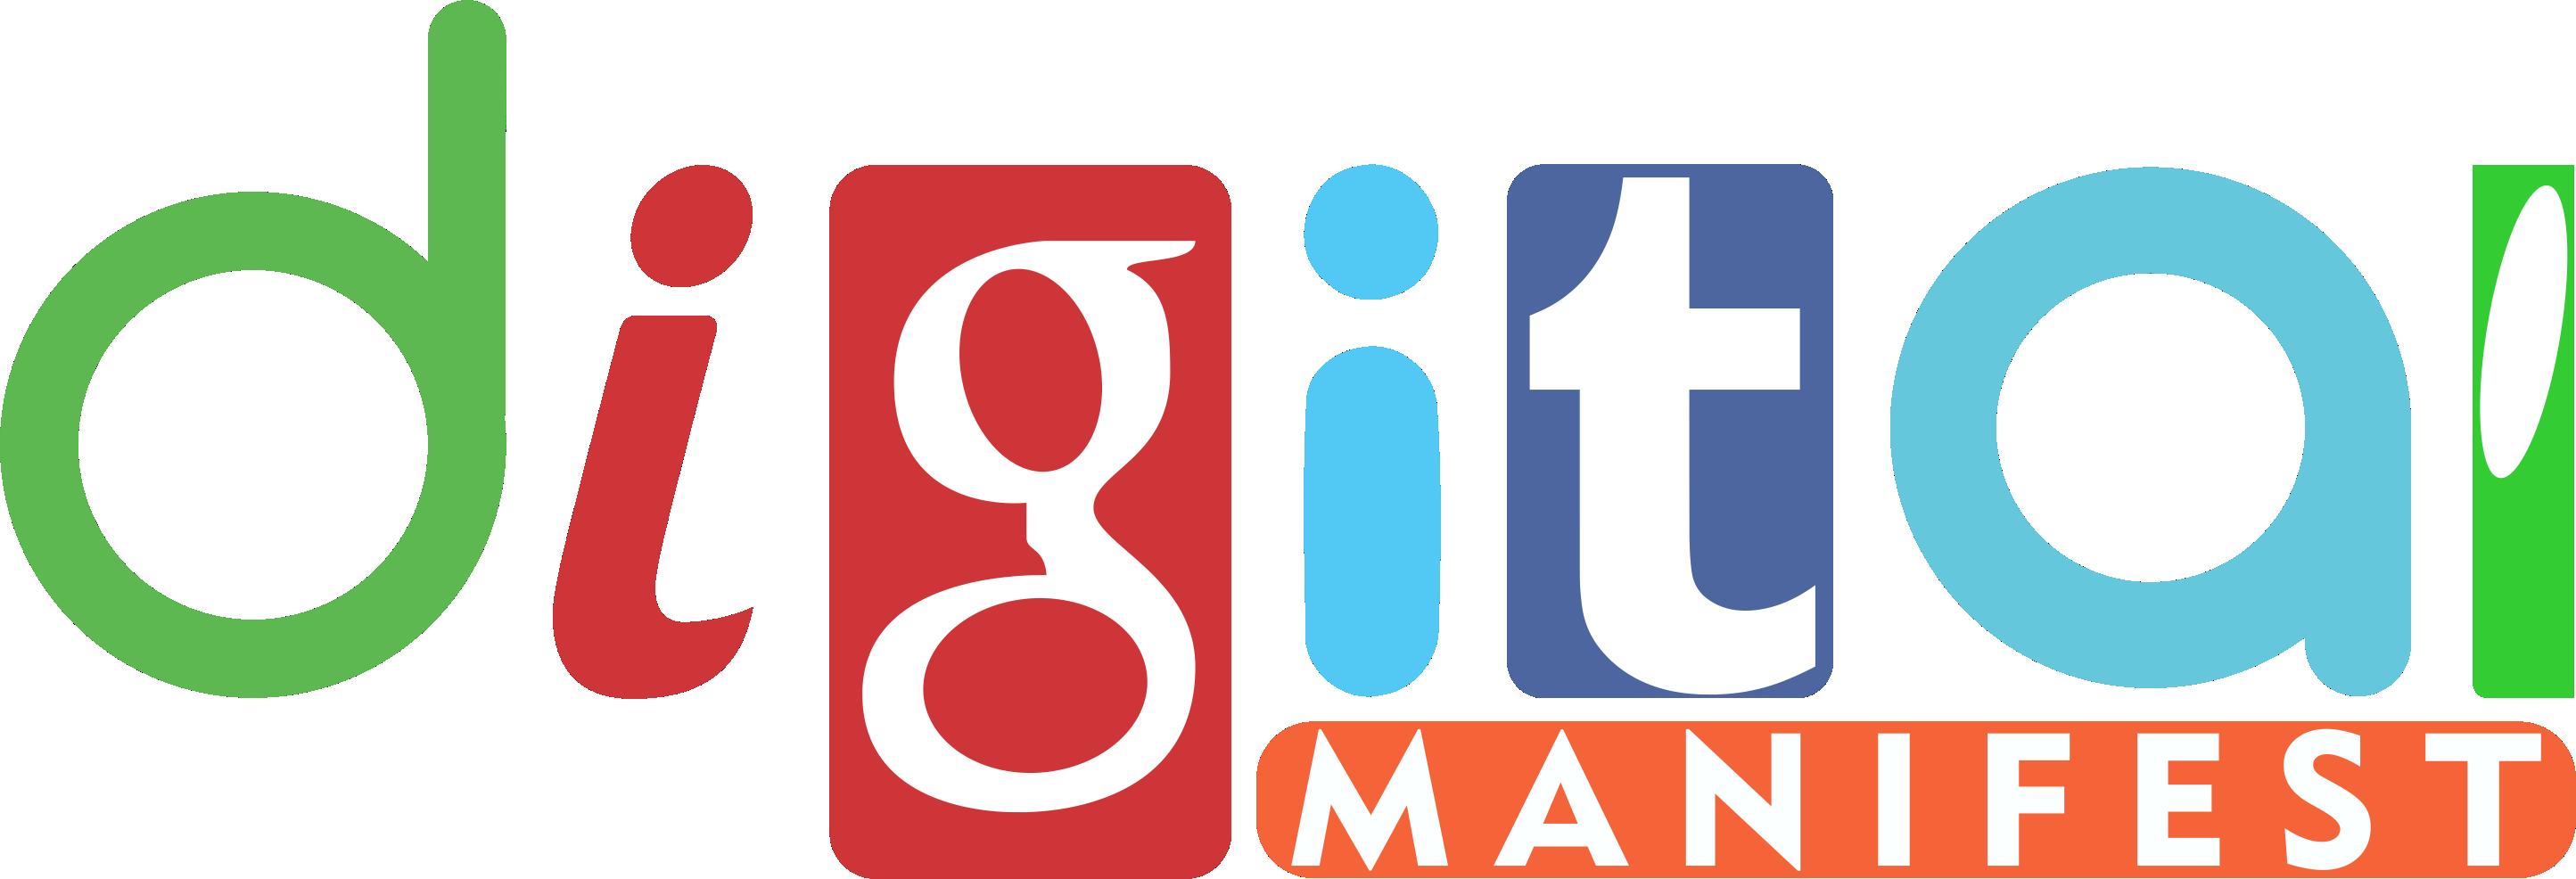 Digital Manifest